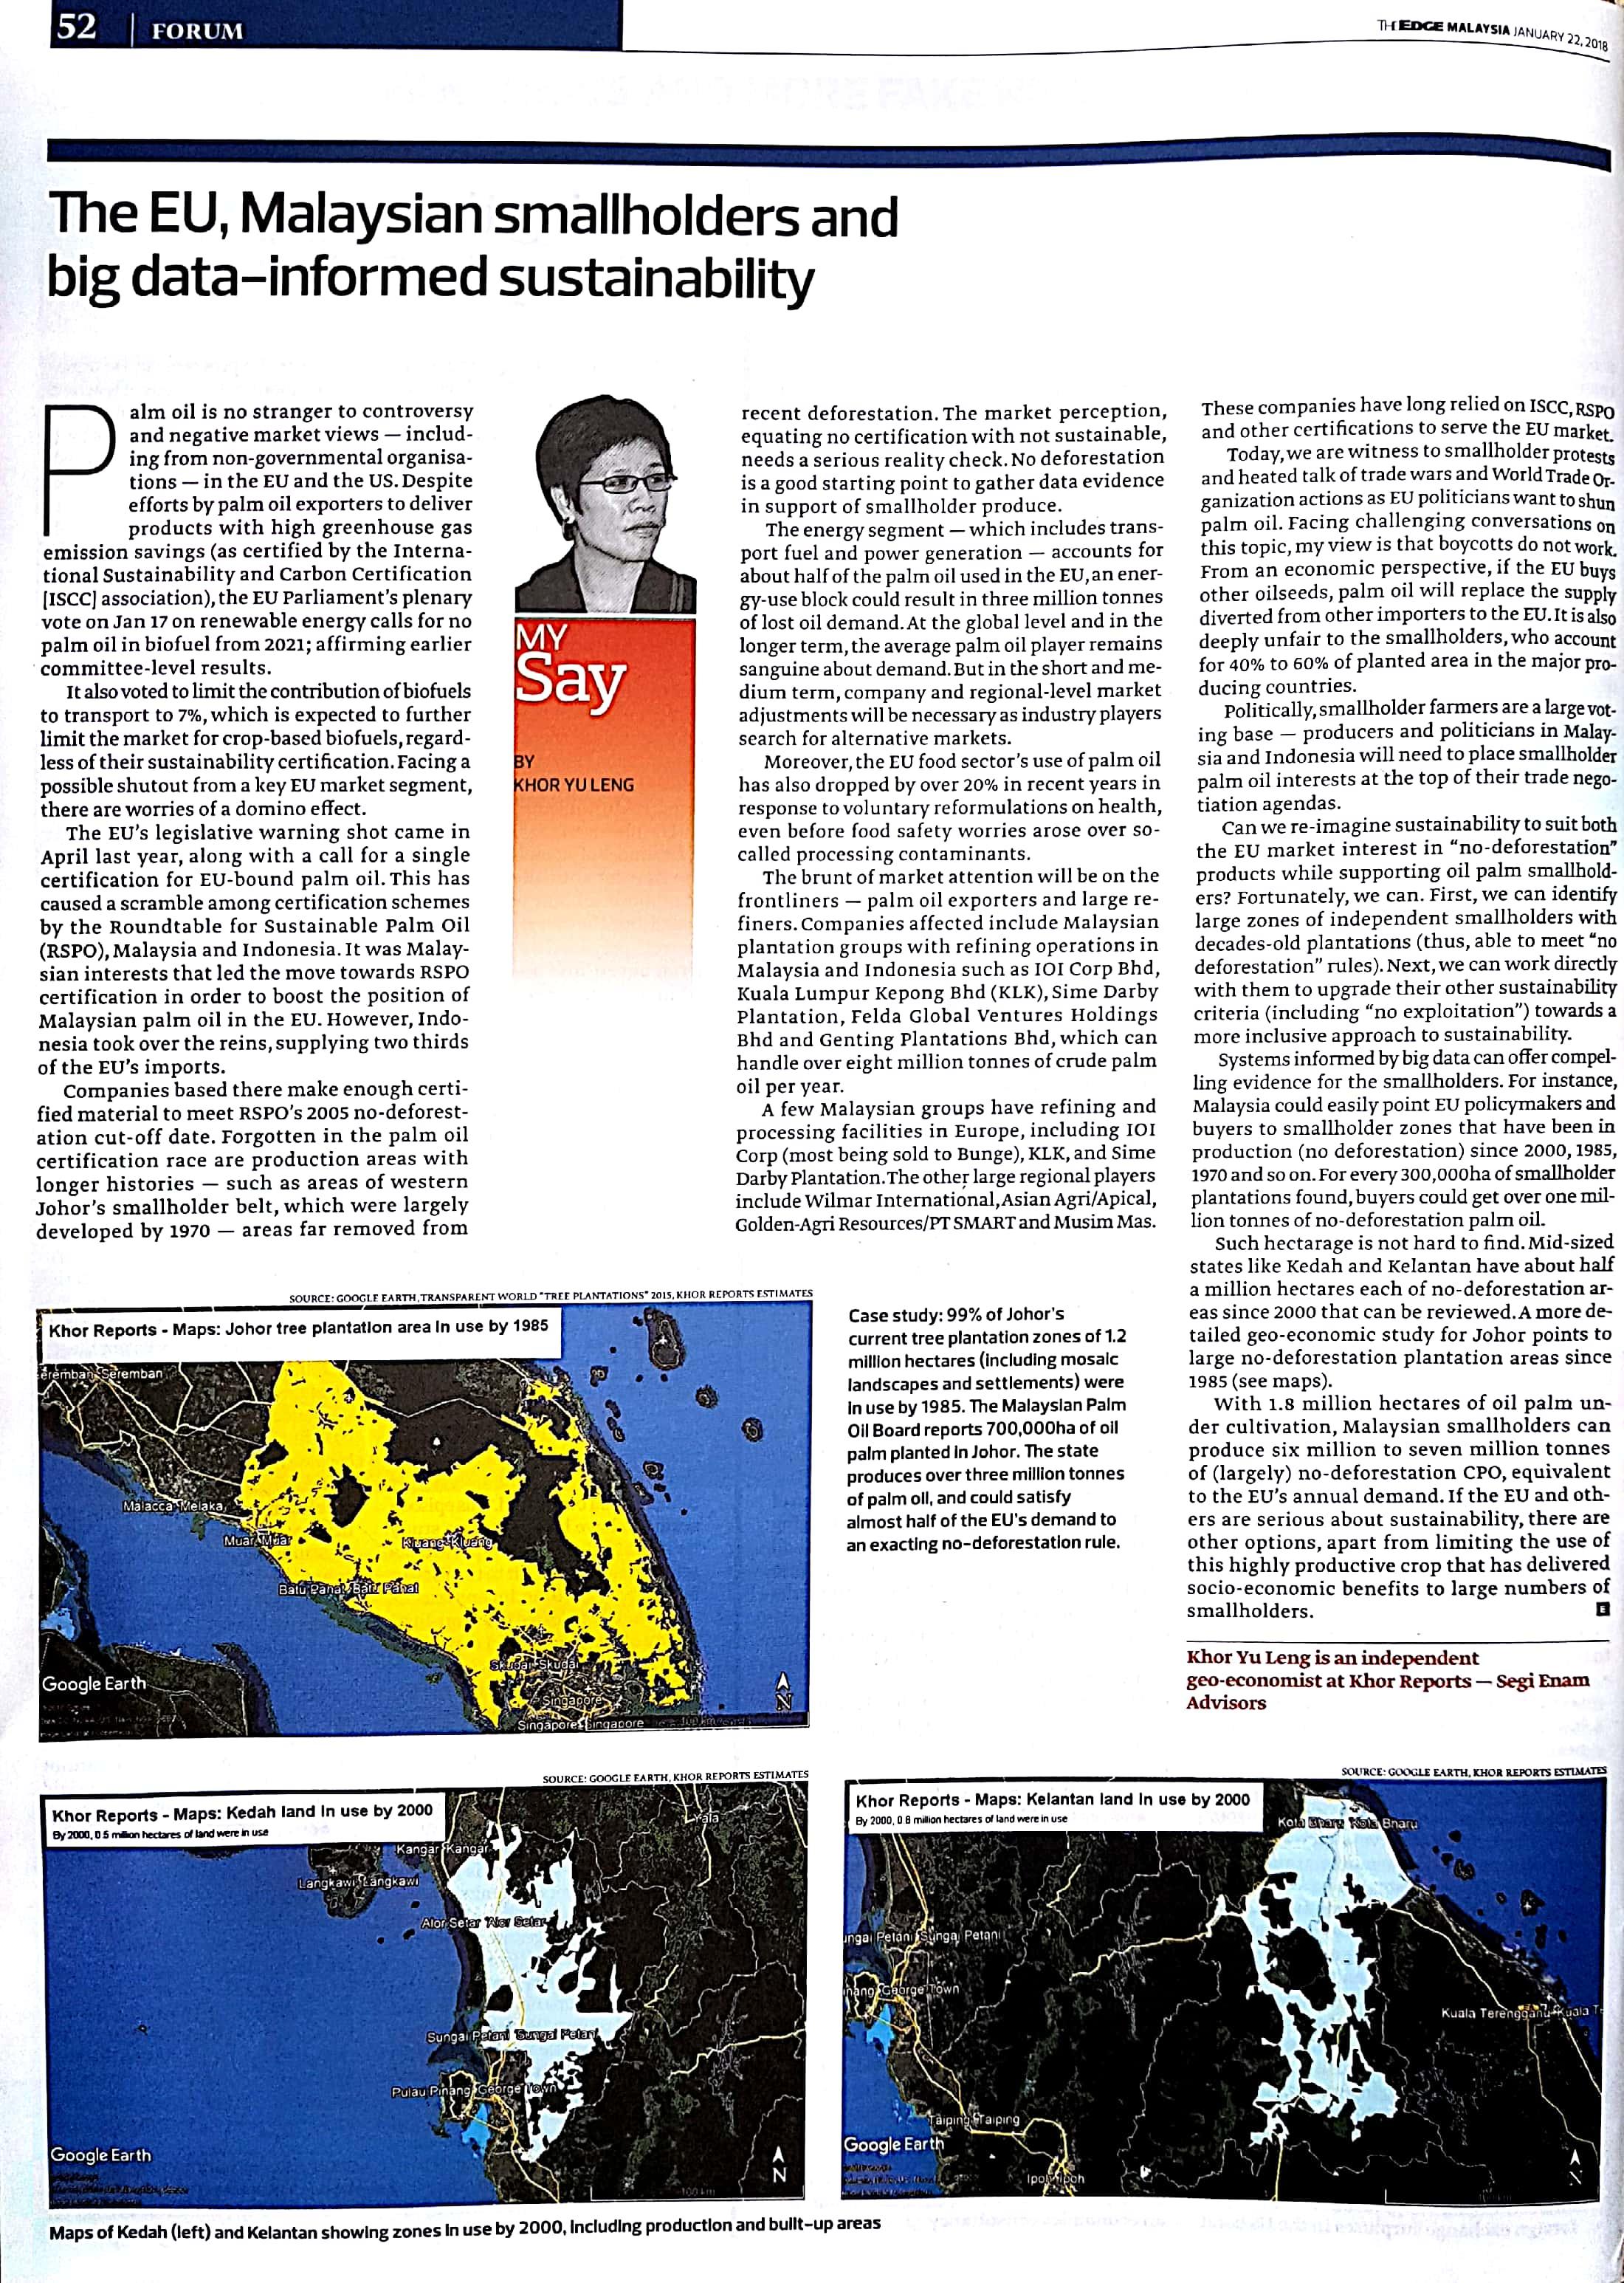 Big data perspective - Geo-economics data published in The Edge Malaysia, The Edge Singapore, 2018